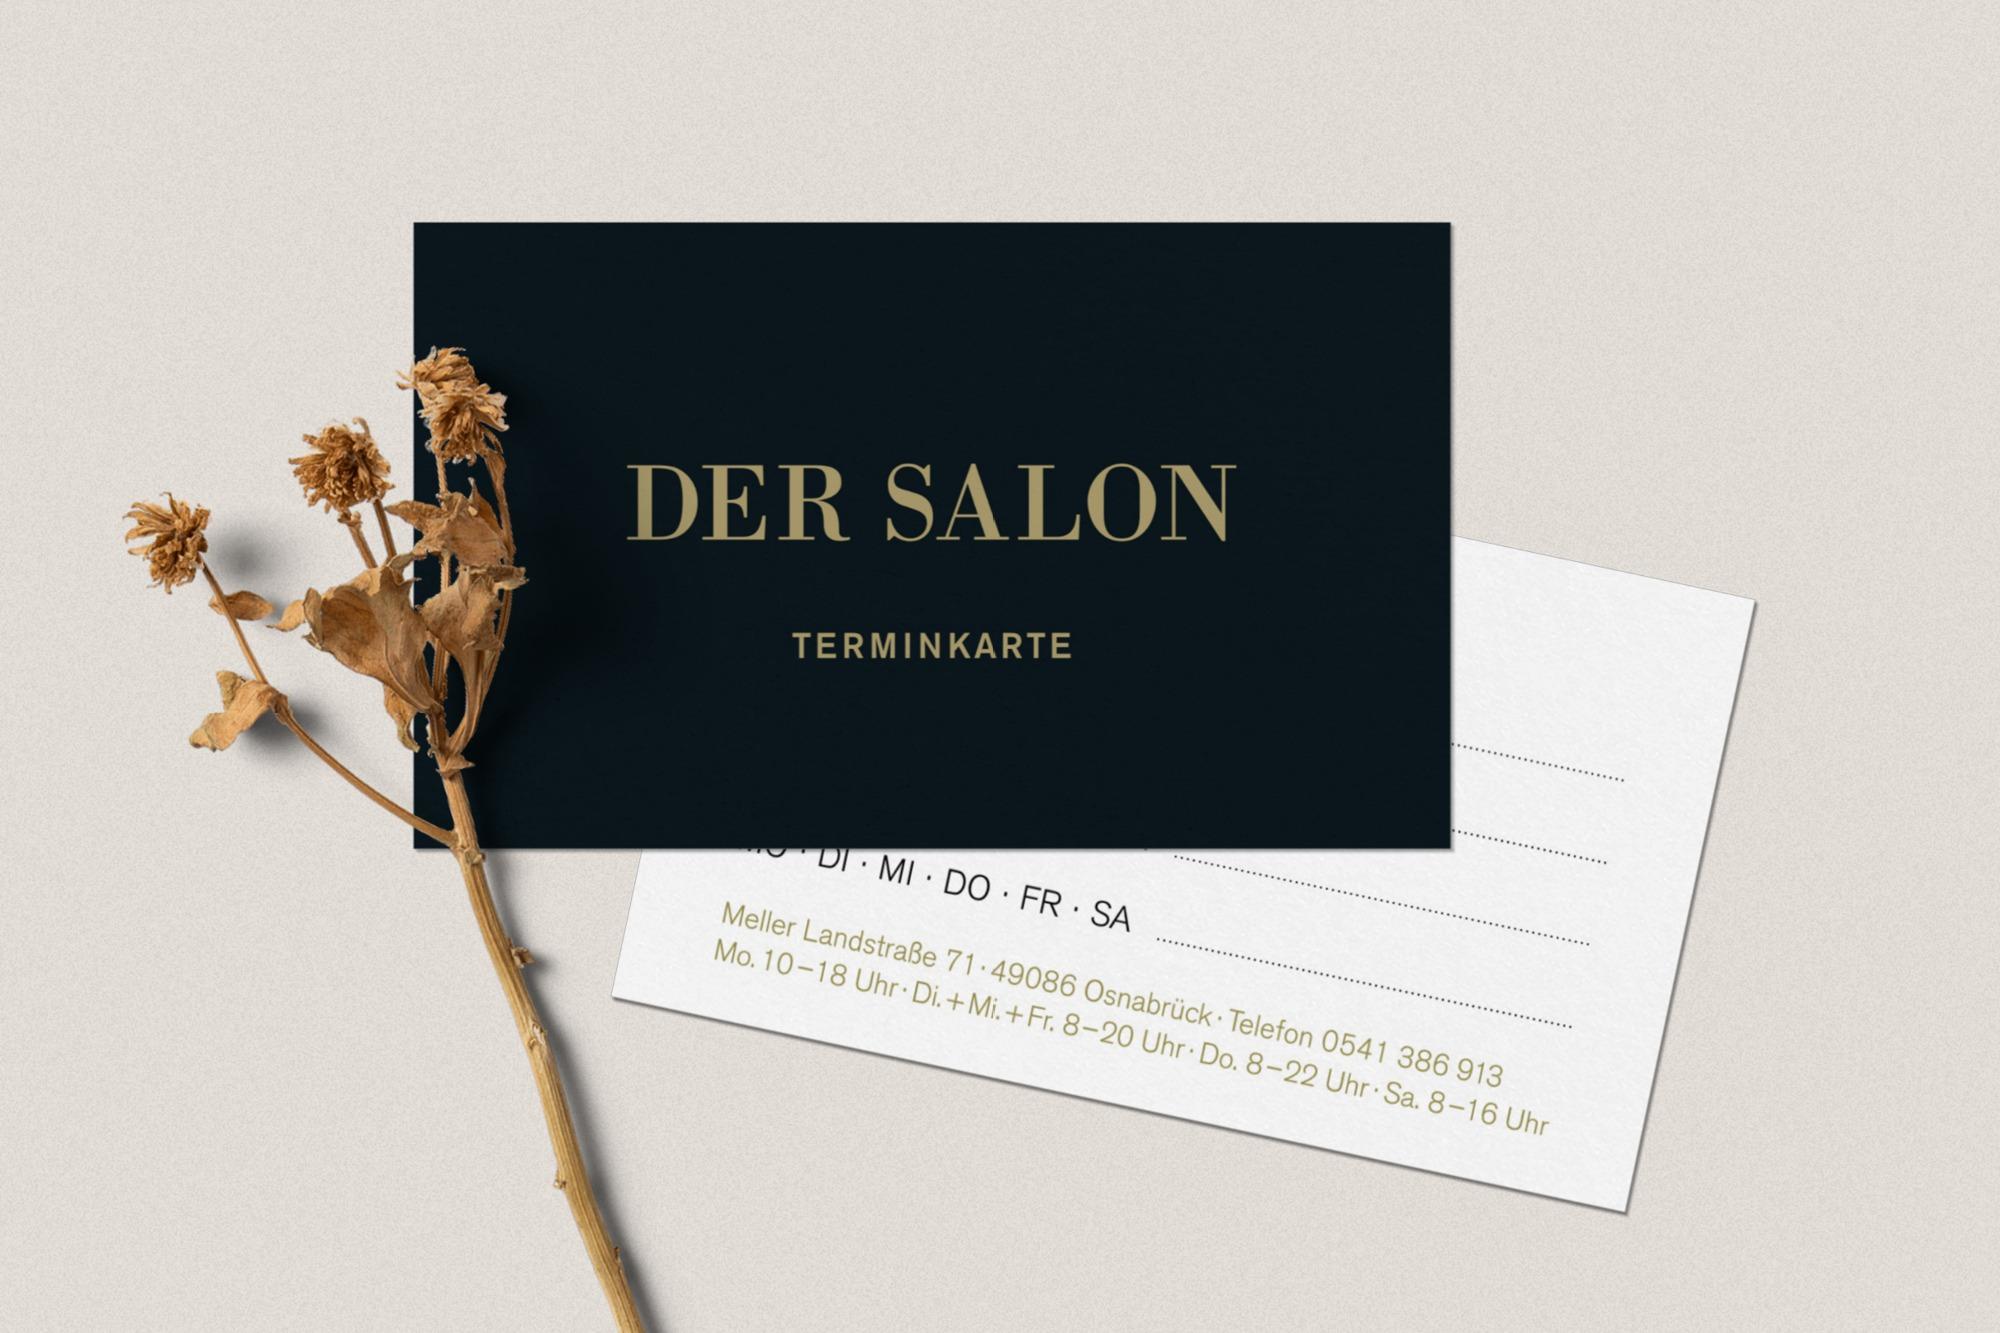 Studio dos, Grafikdesign Osnabrück, Der Salon Terminkarten